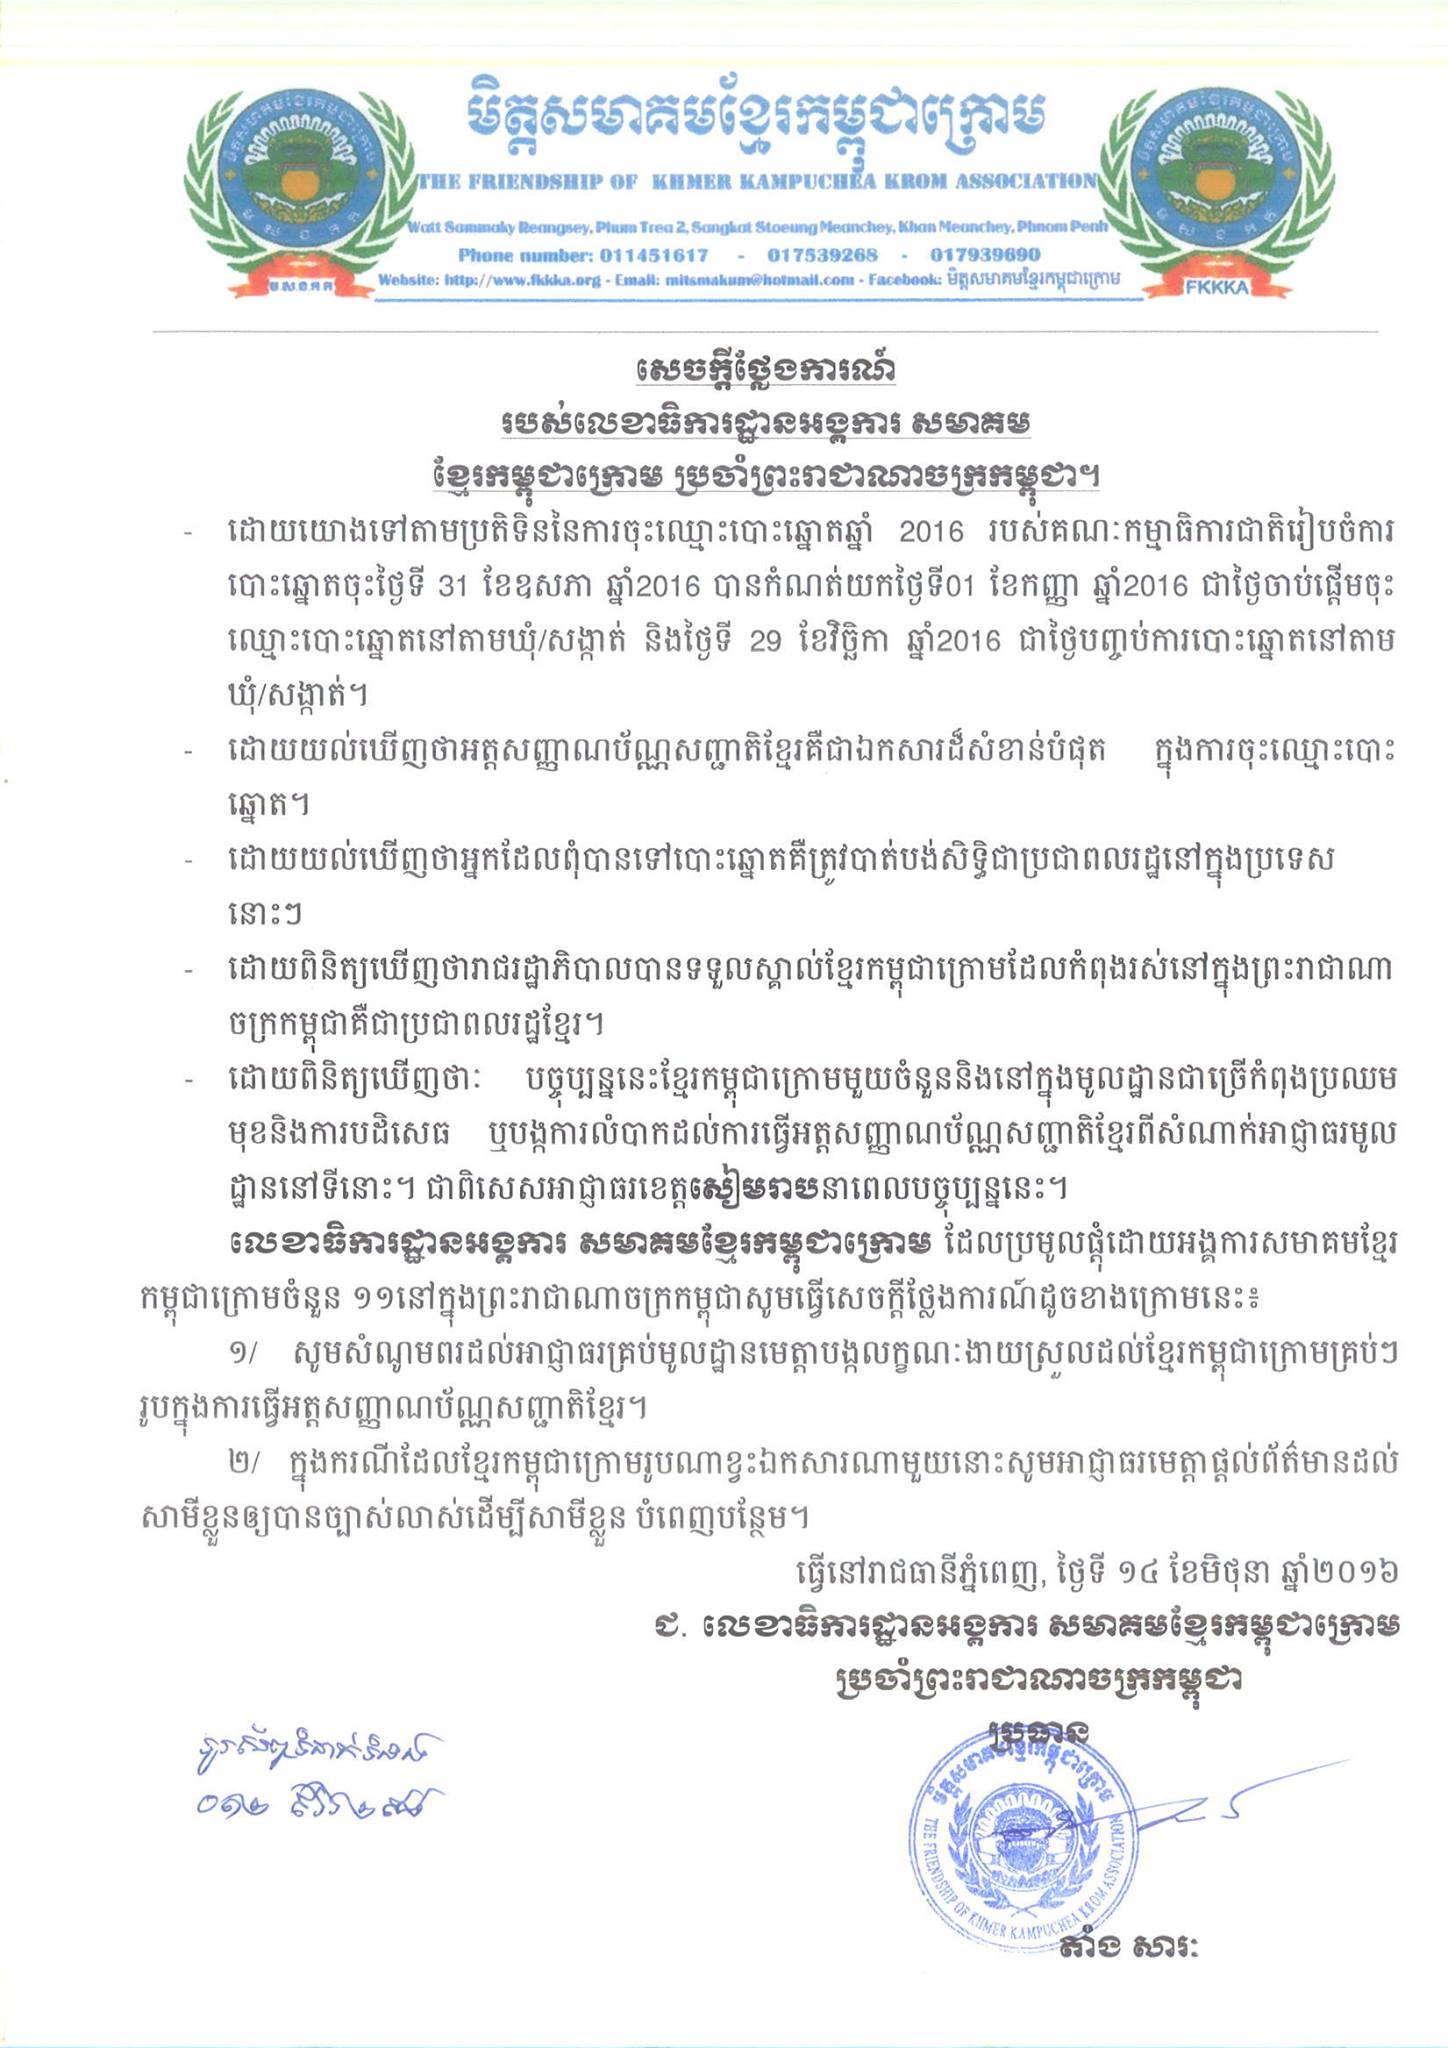 Statement kk in Cambodia